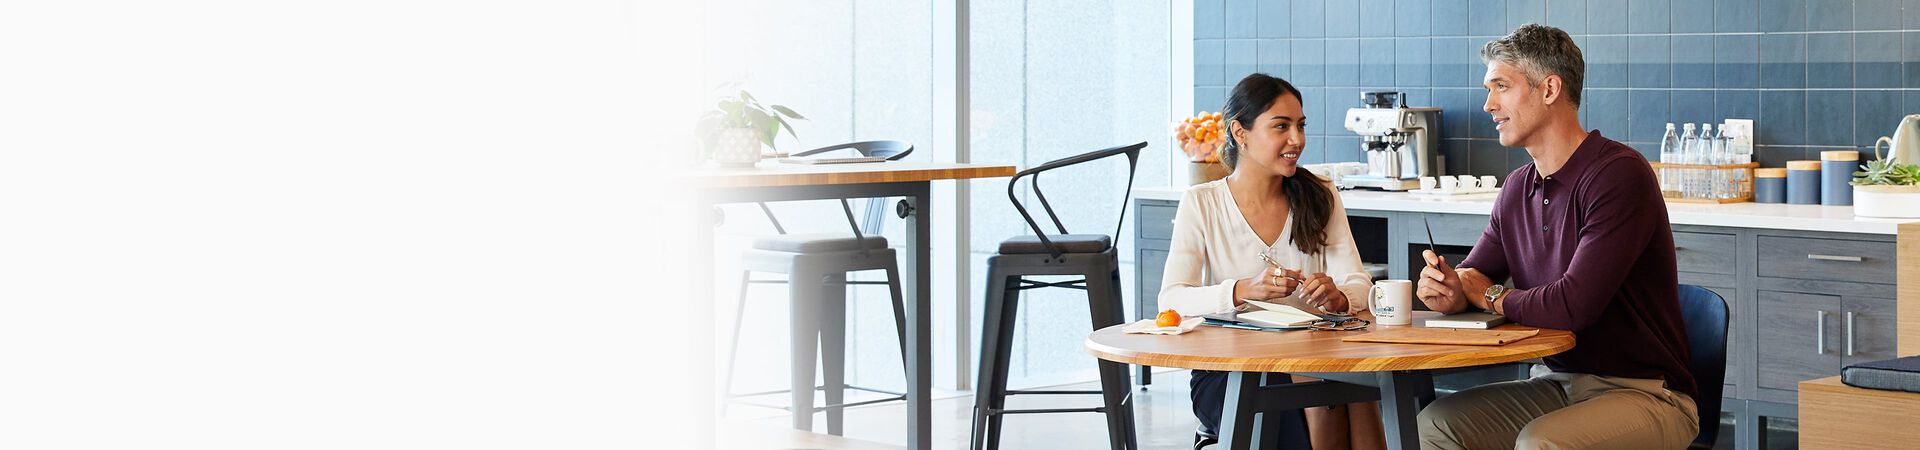 vari office furniture in use